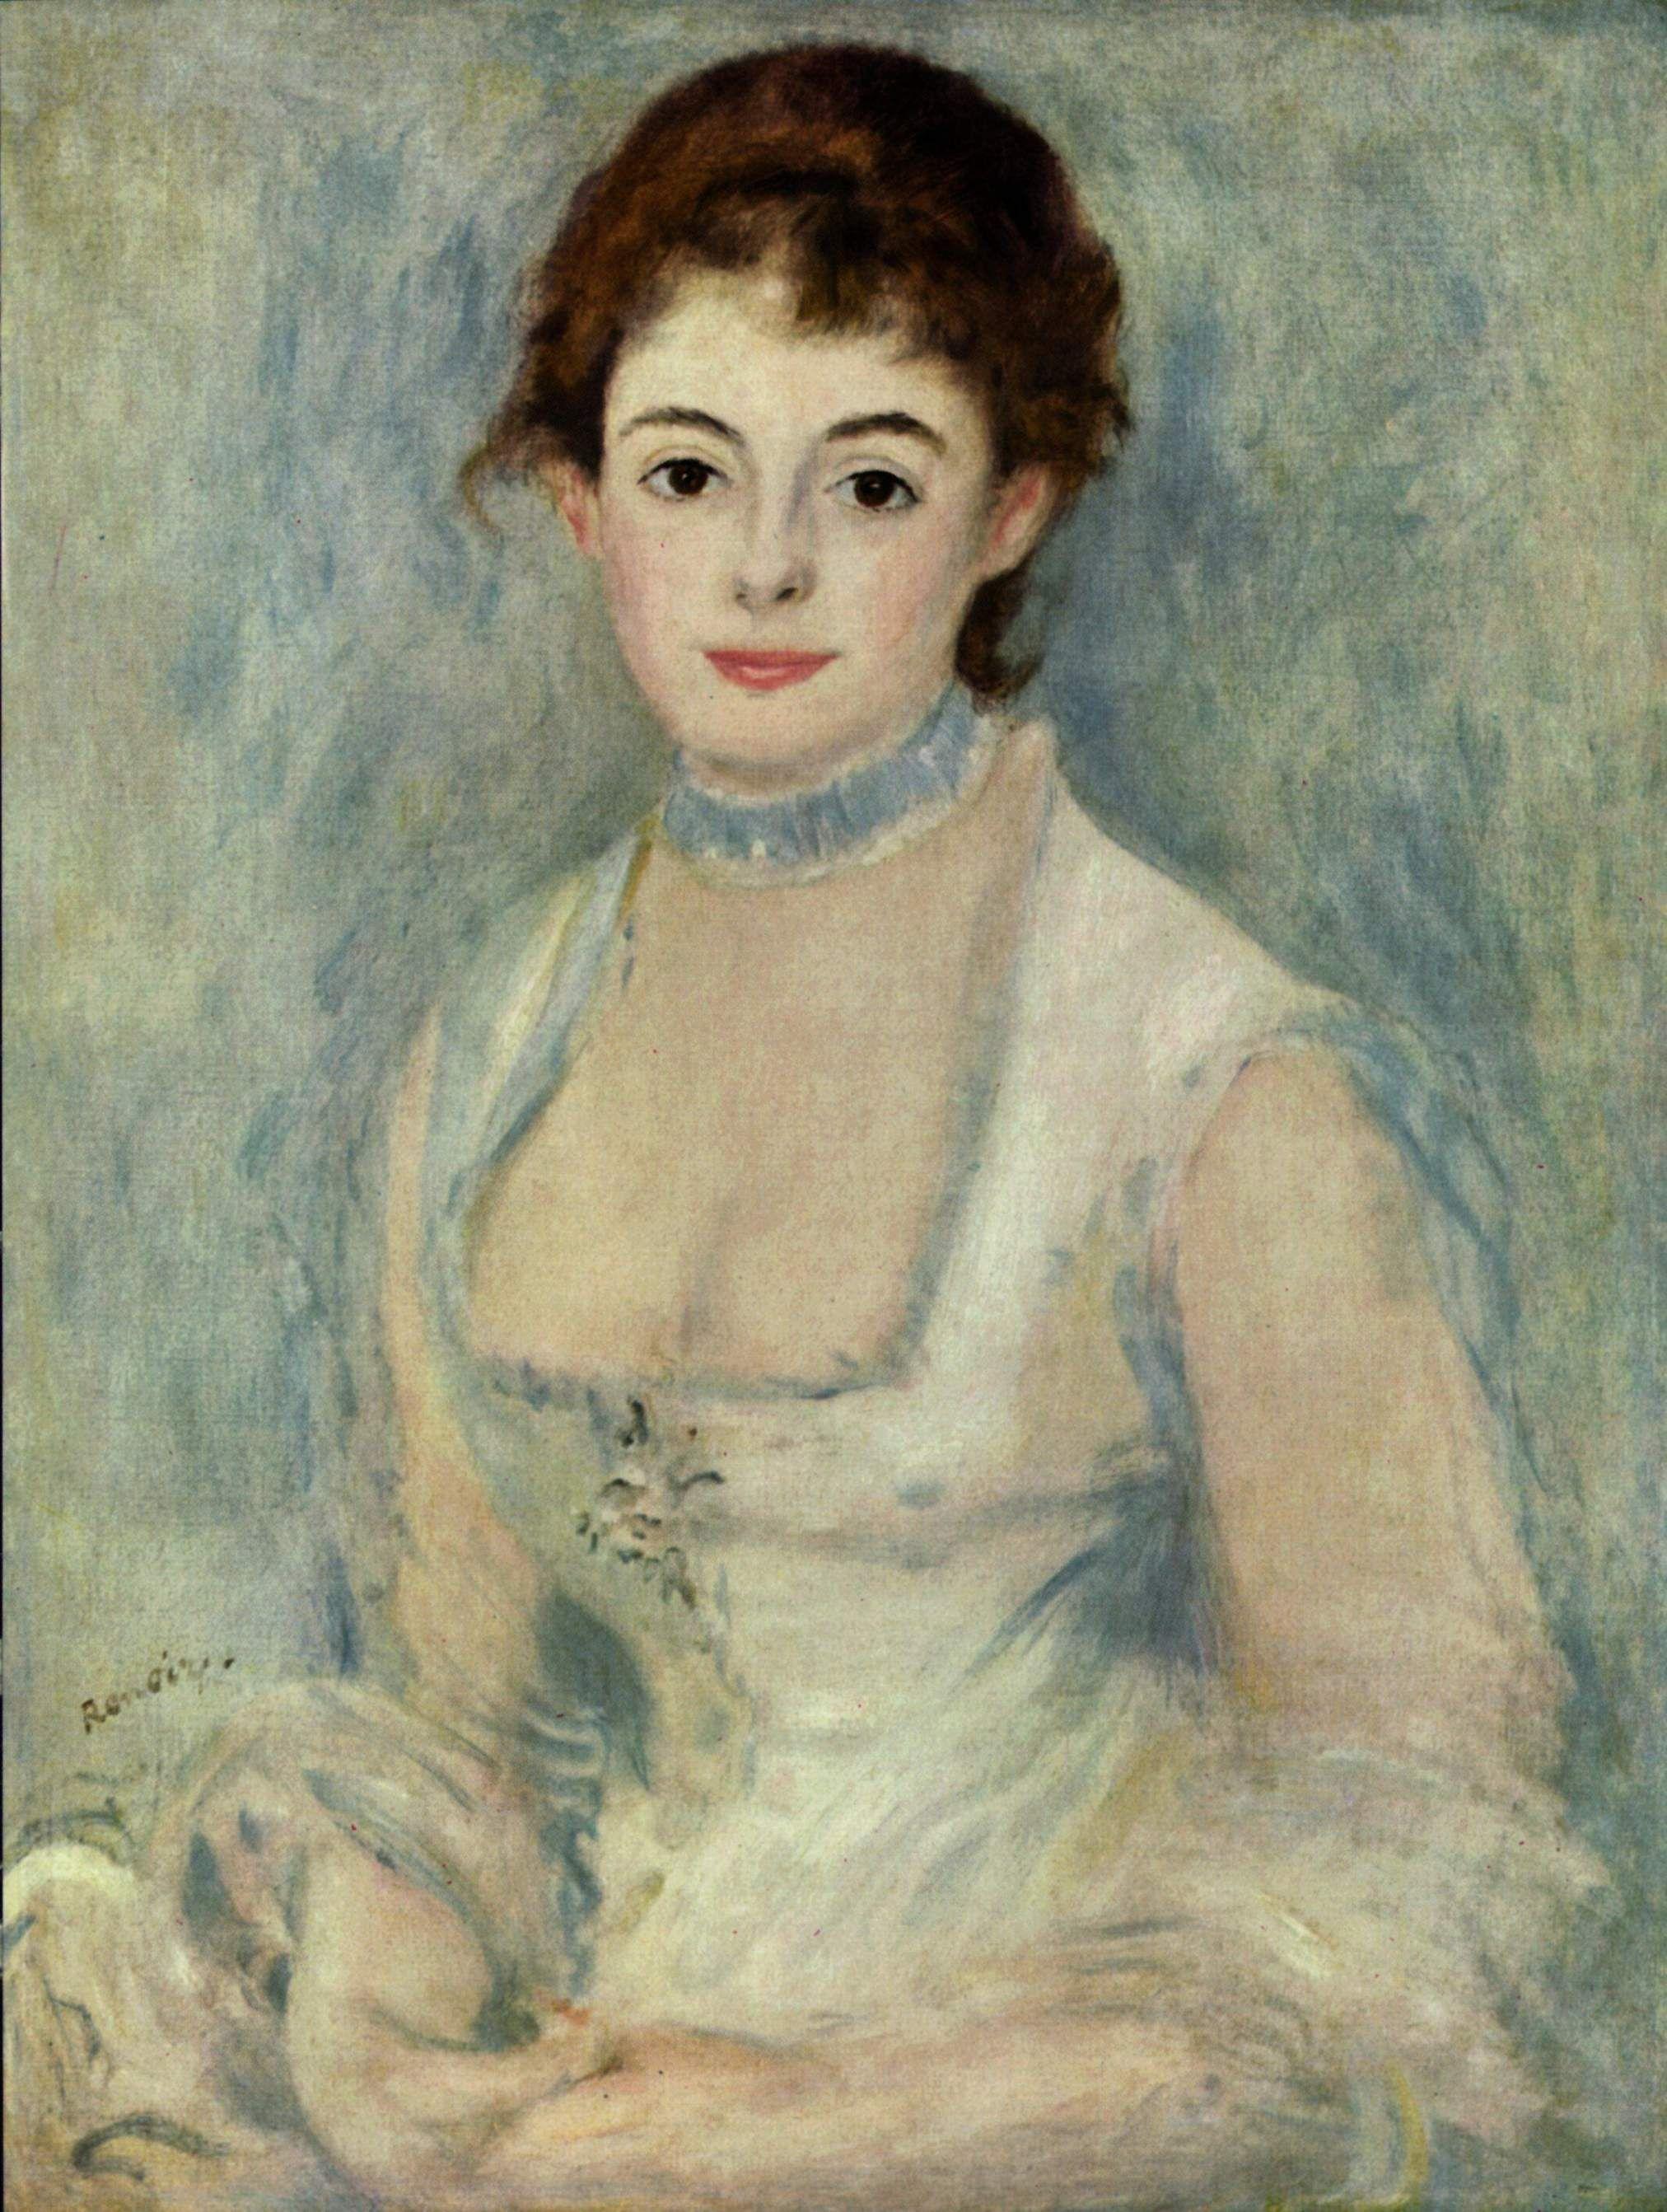 Madame henriot 1876 pierre auguste renoir pierre for Auguste renoir